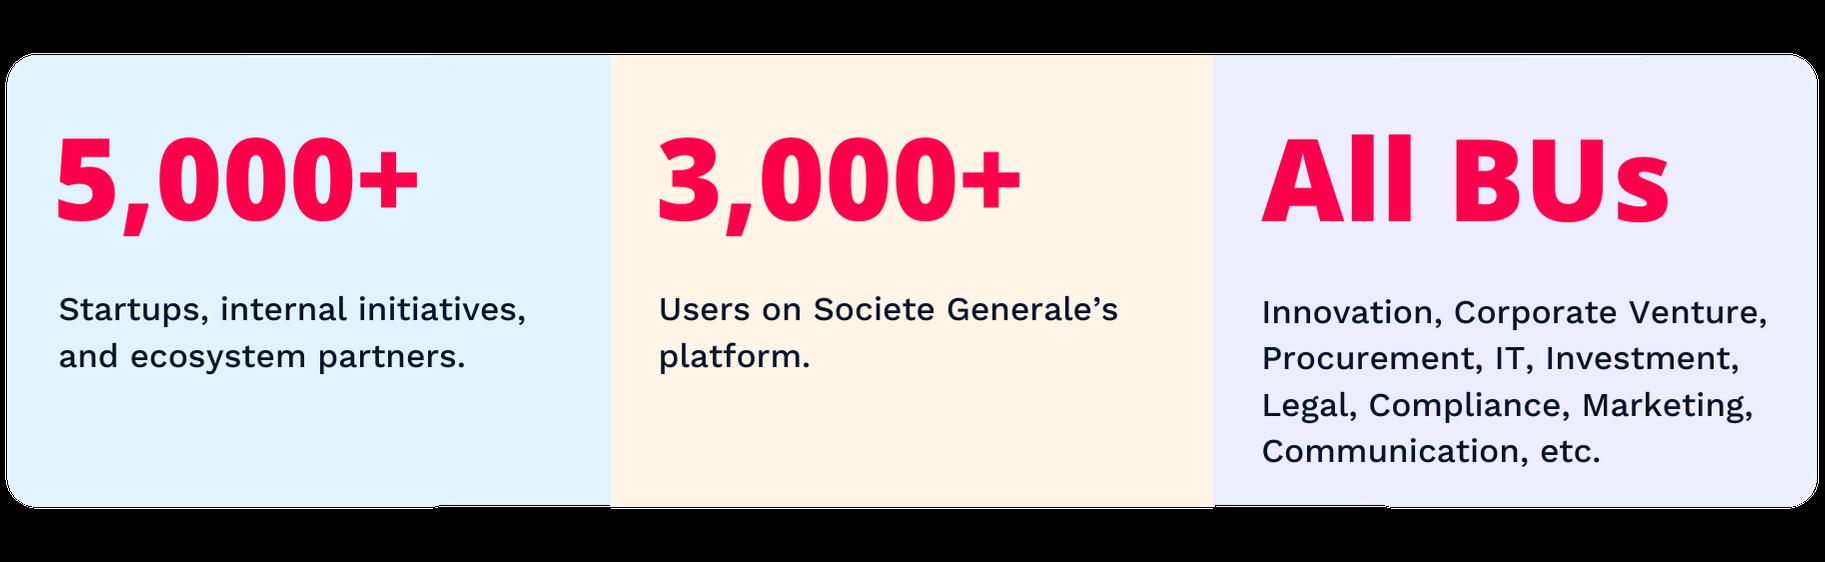 Societe Generale's Key Metrics